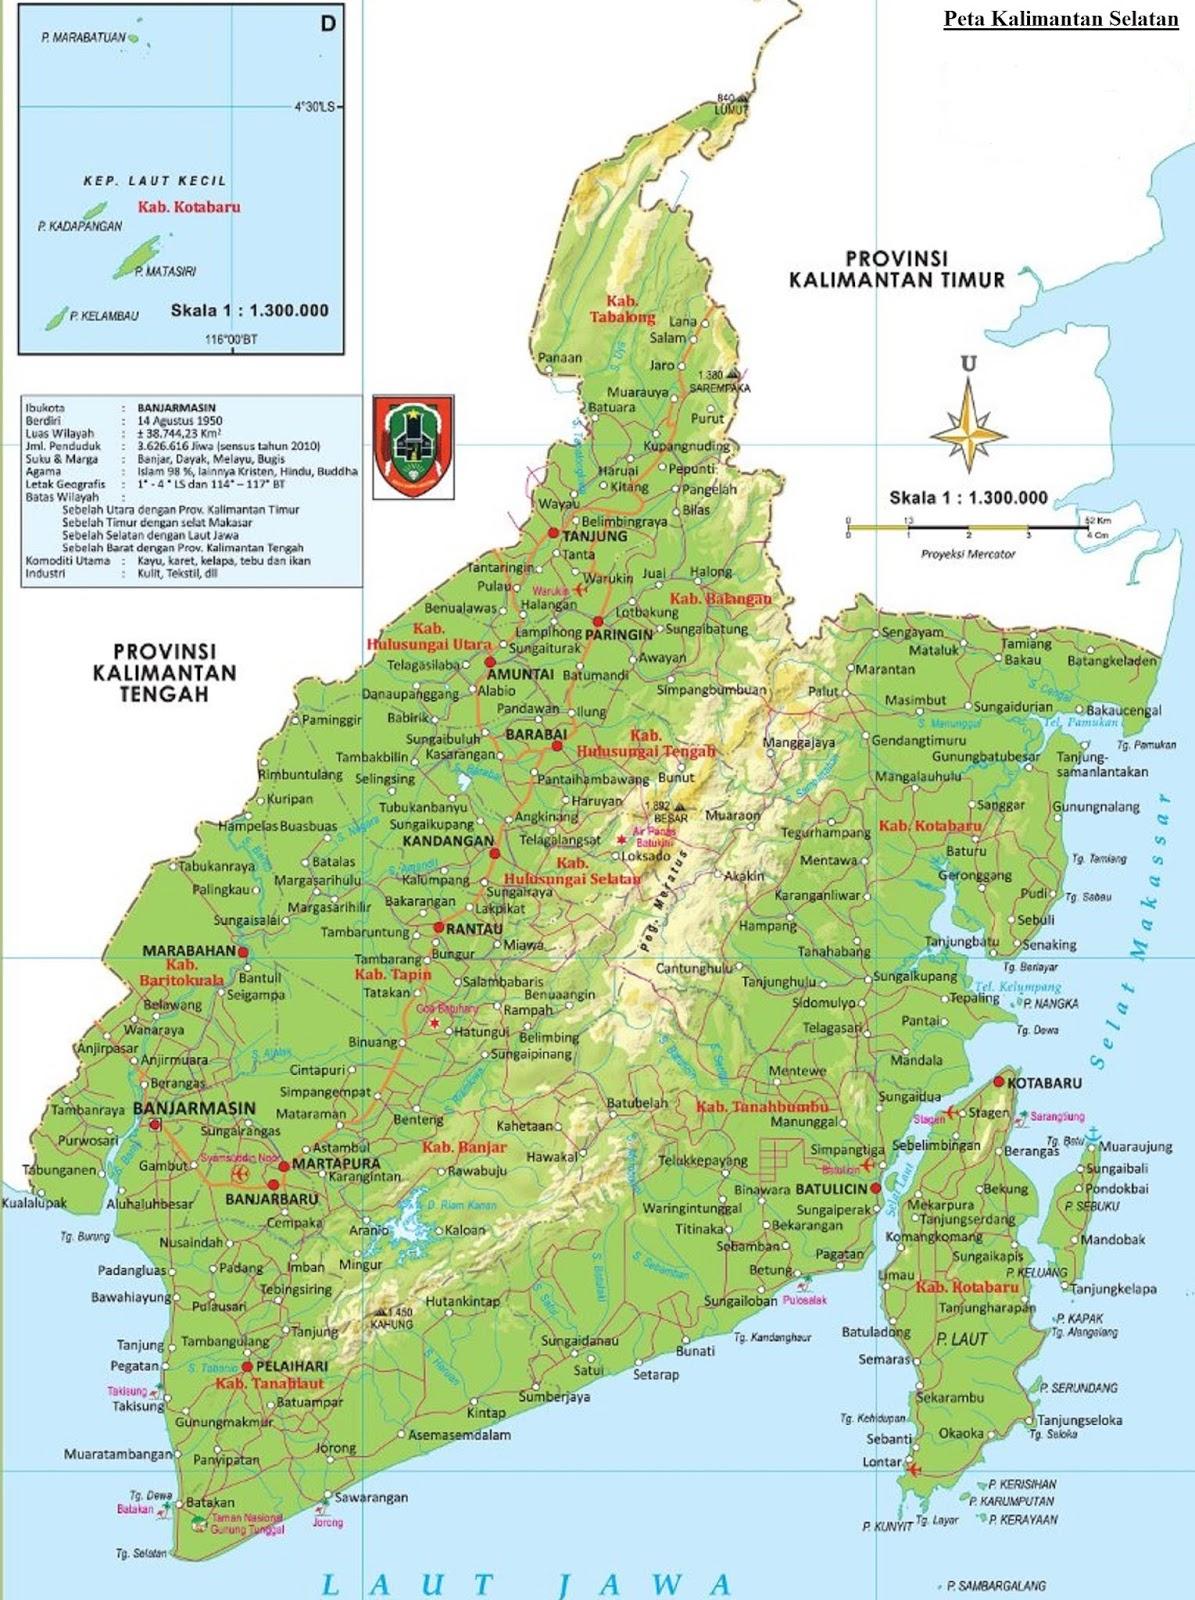 Peta Kalimantan Selatan HD